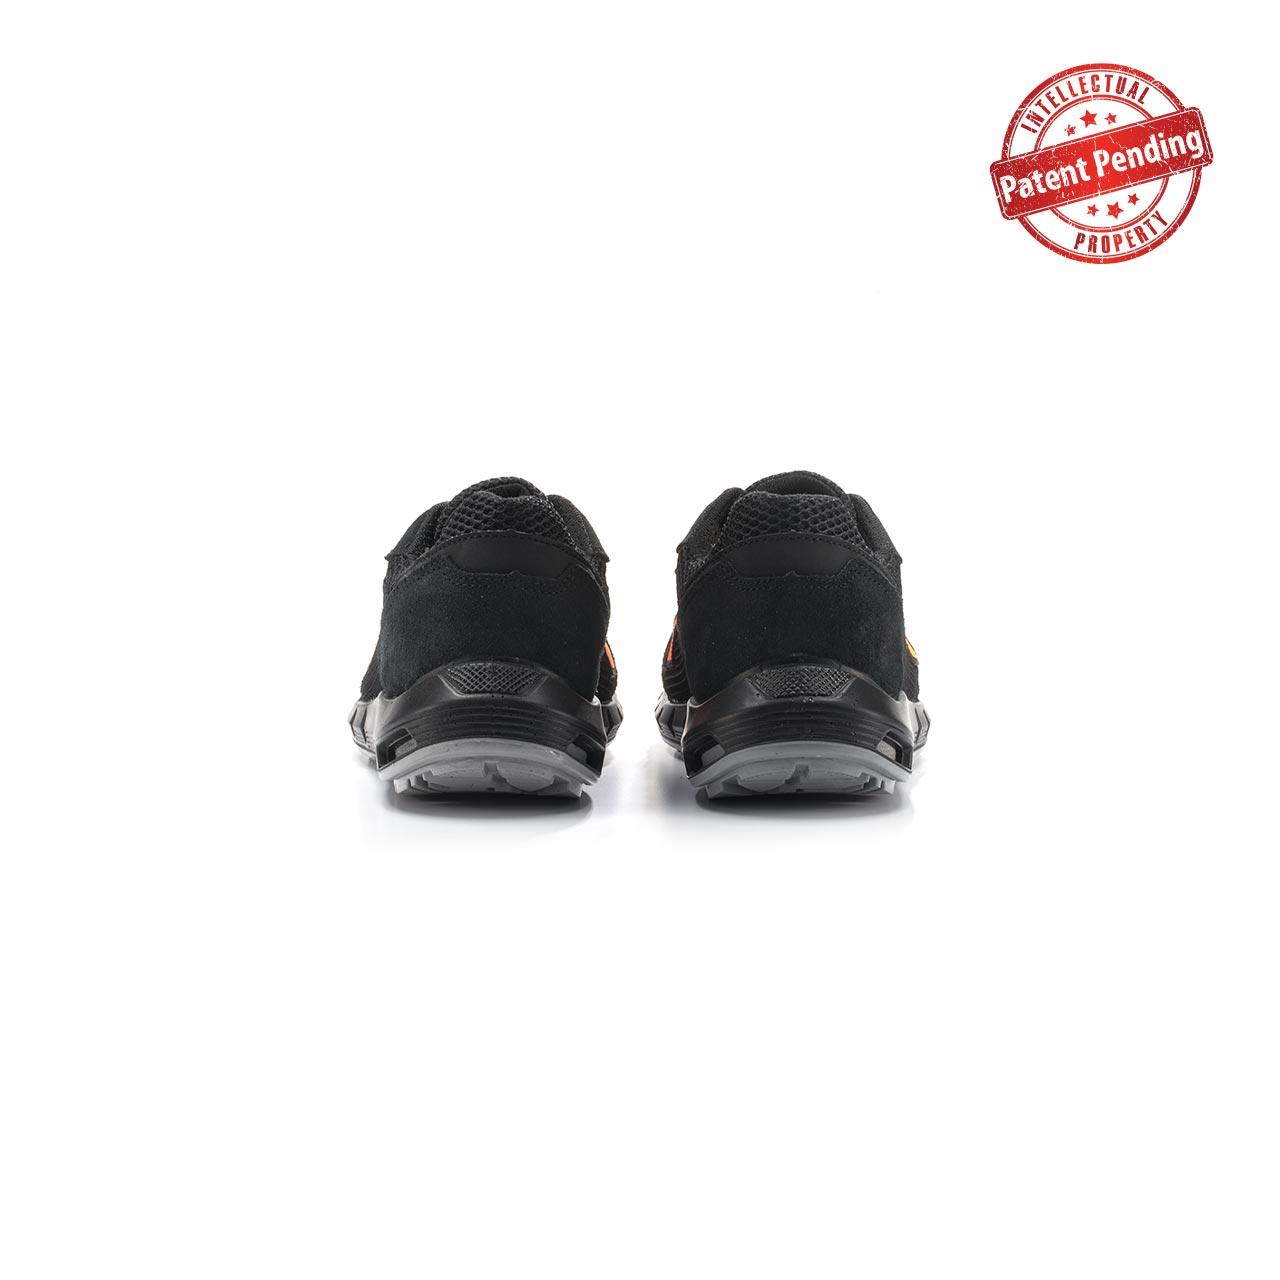 paio di scarpe antinfortunistiche upower modello atos linea redup plus vista retro